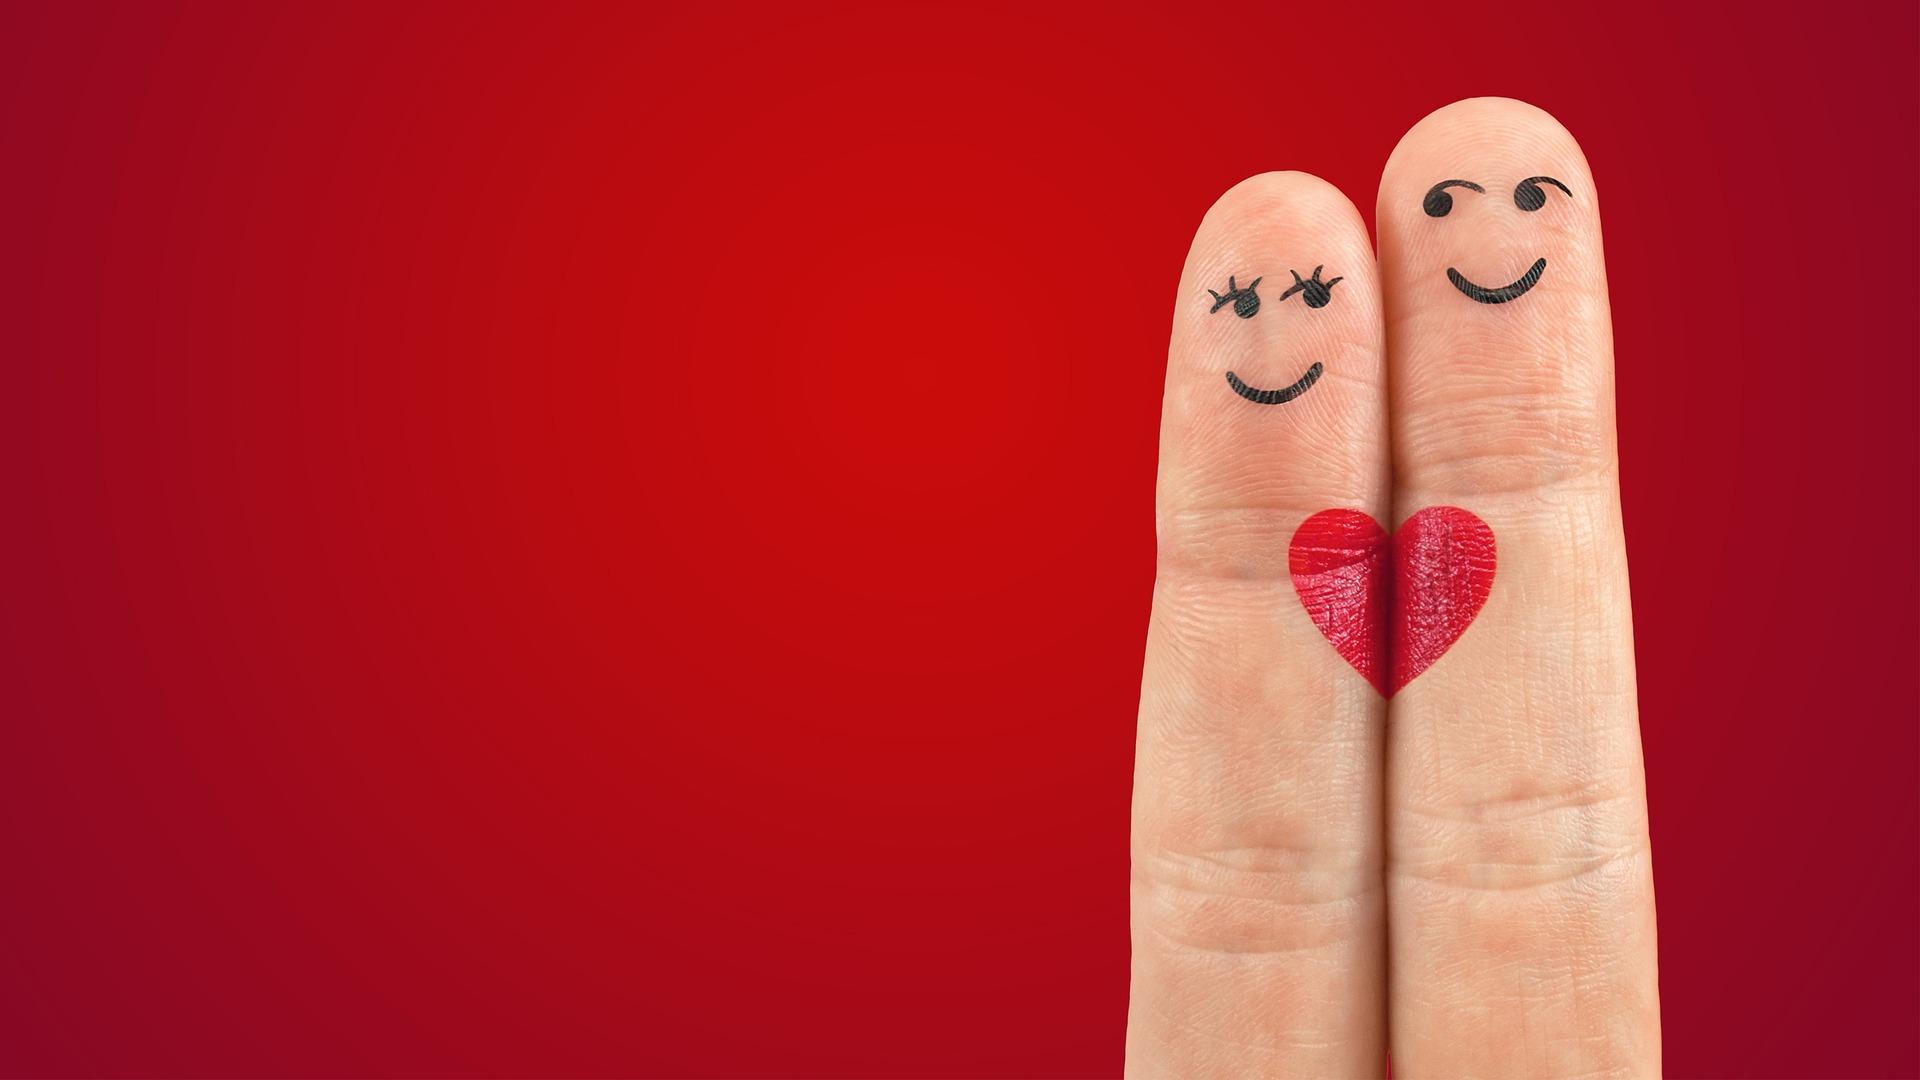 horoscop dragoste - sfatulparintilor.ro - pixabay_com - art-1839006_1920